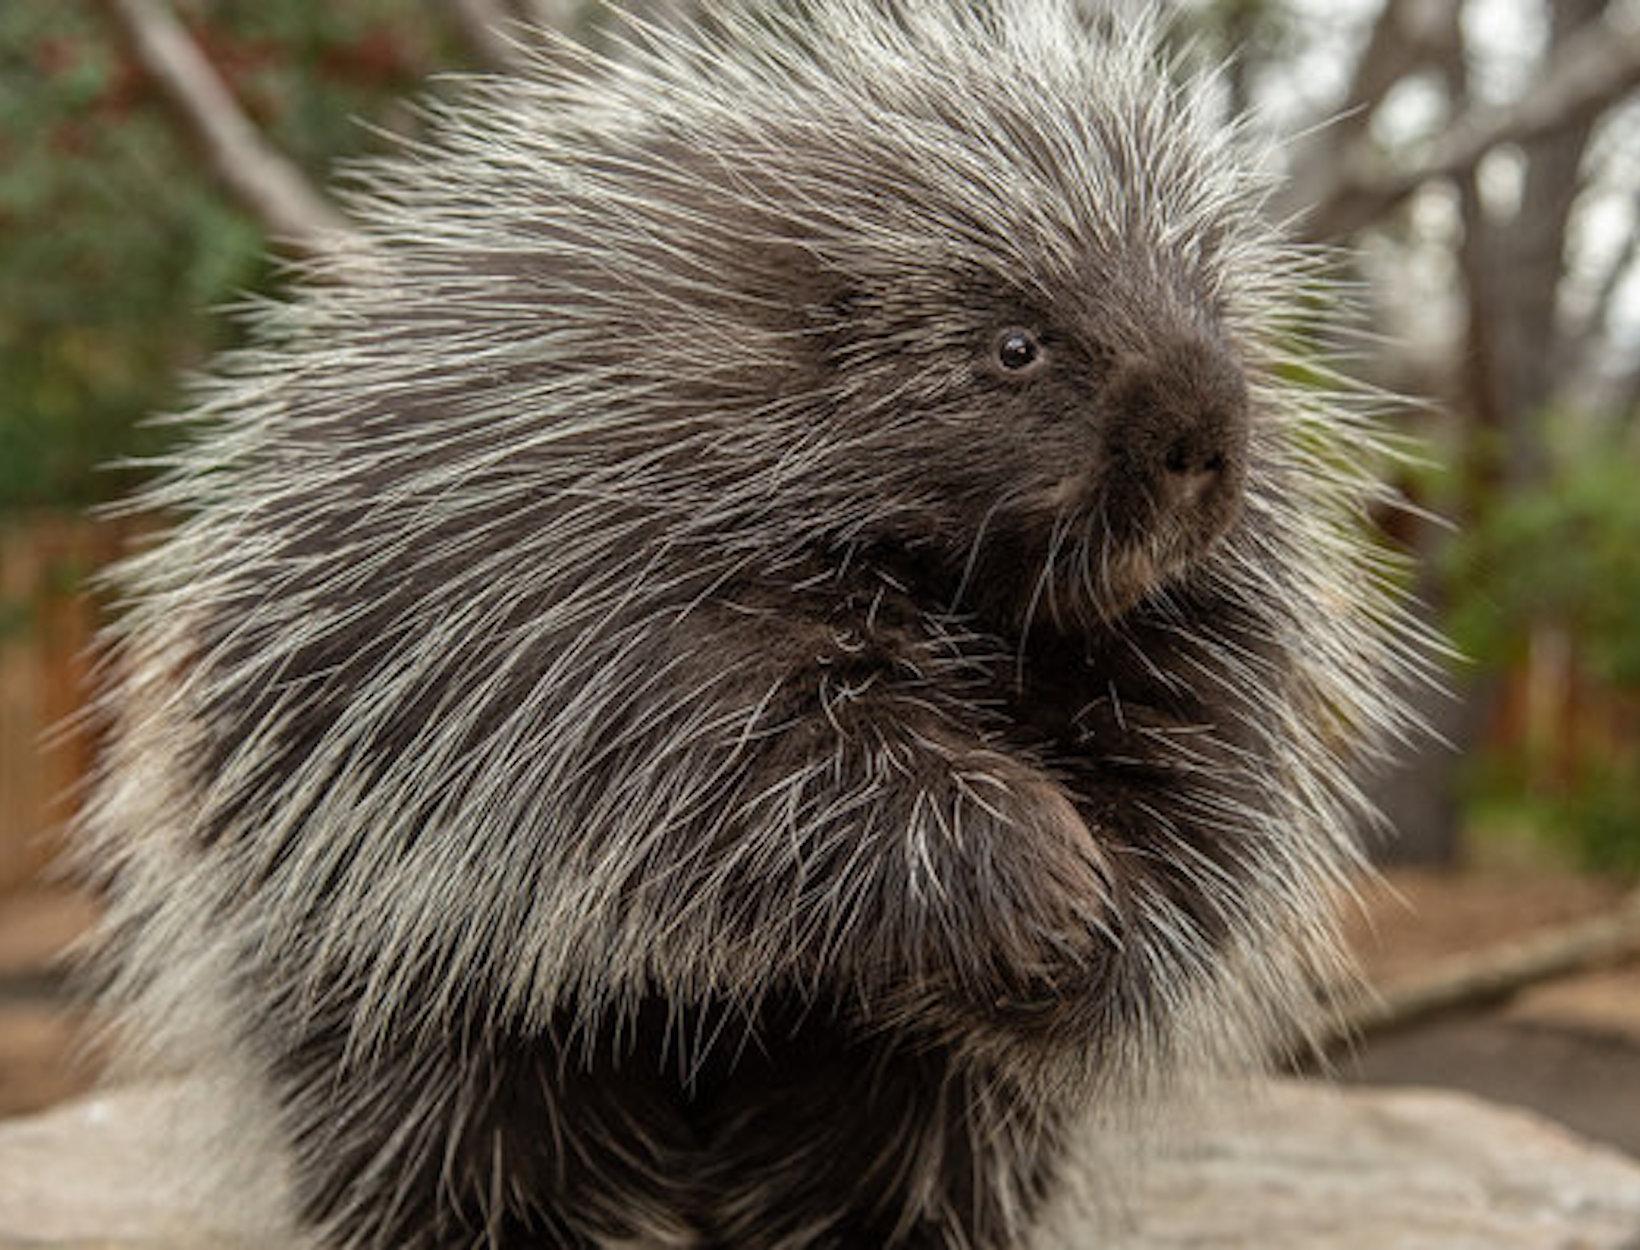 Porcupine Barbs for Better Wound Healing